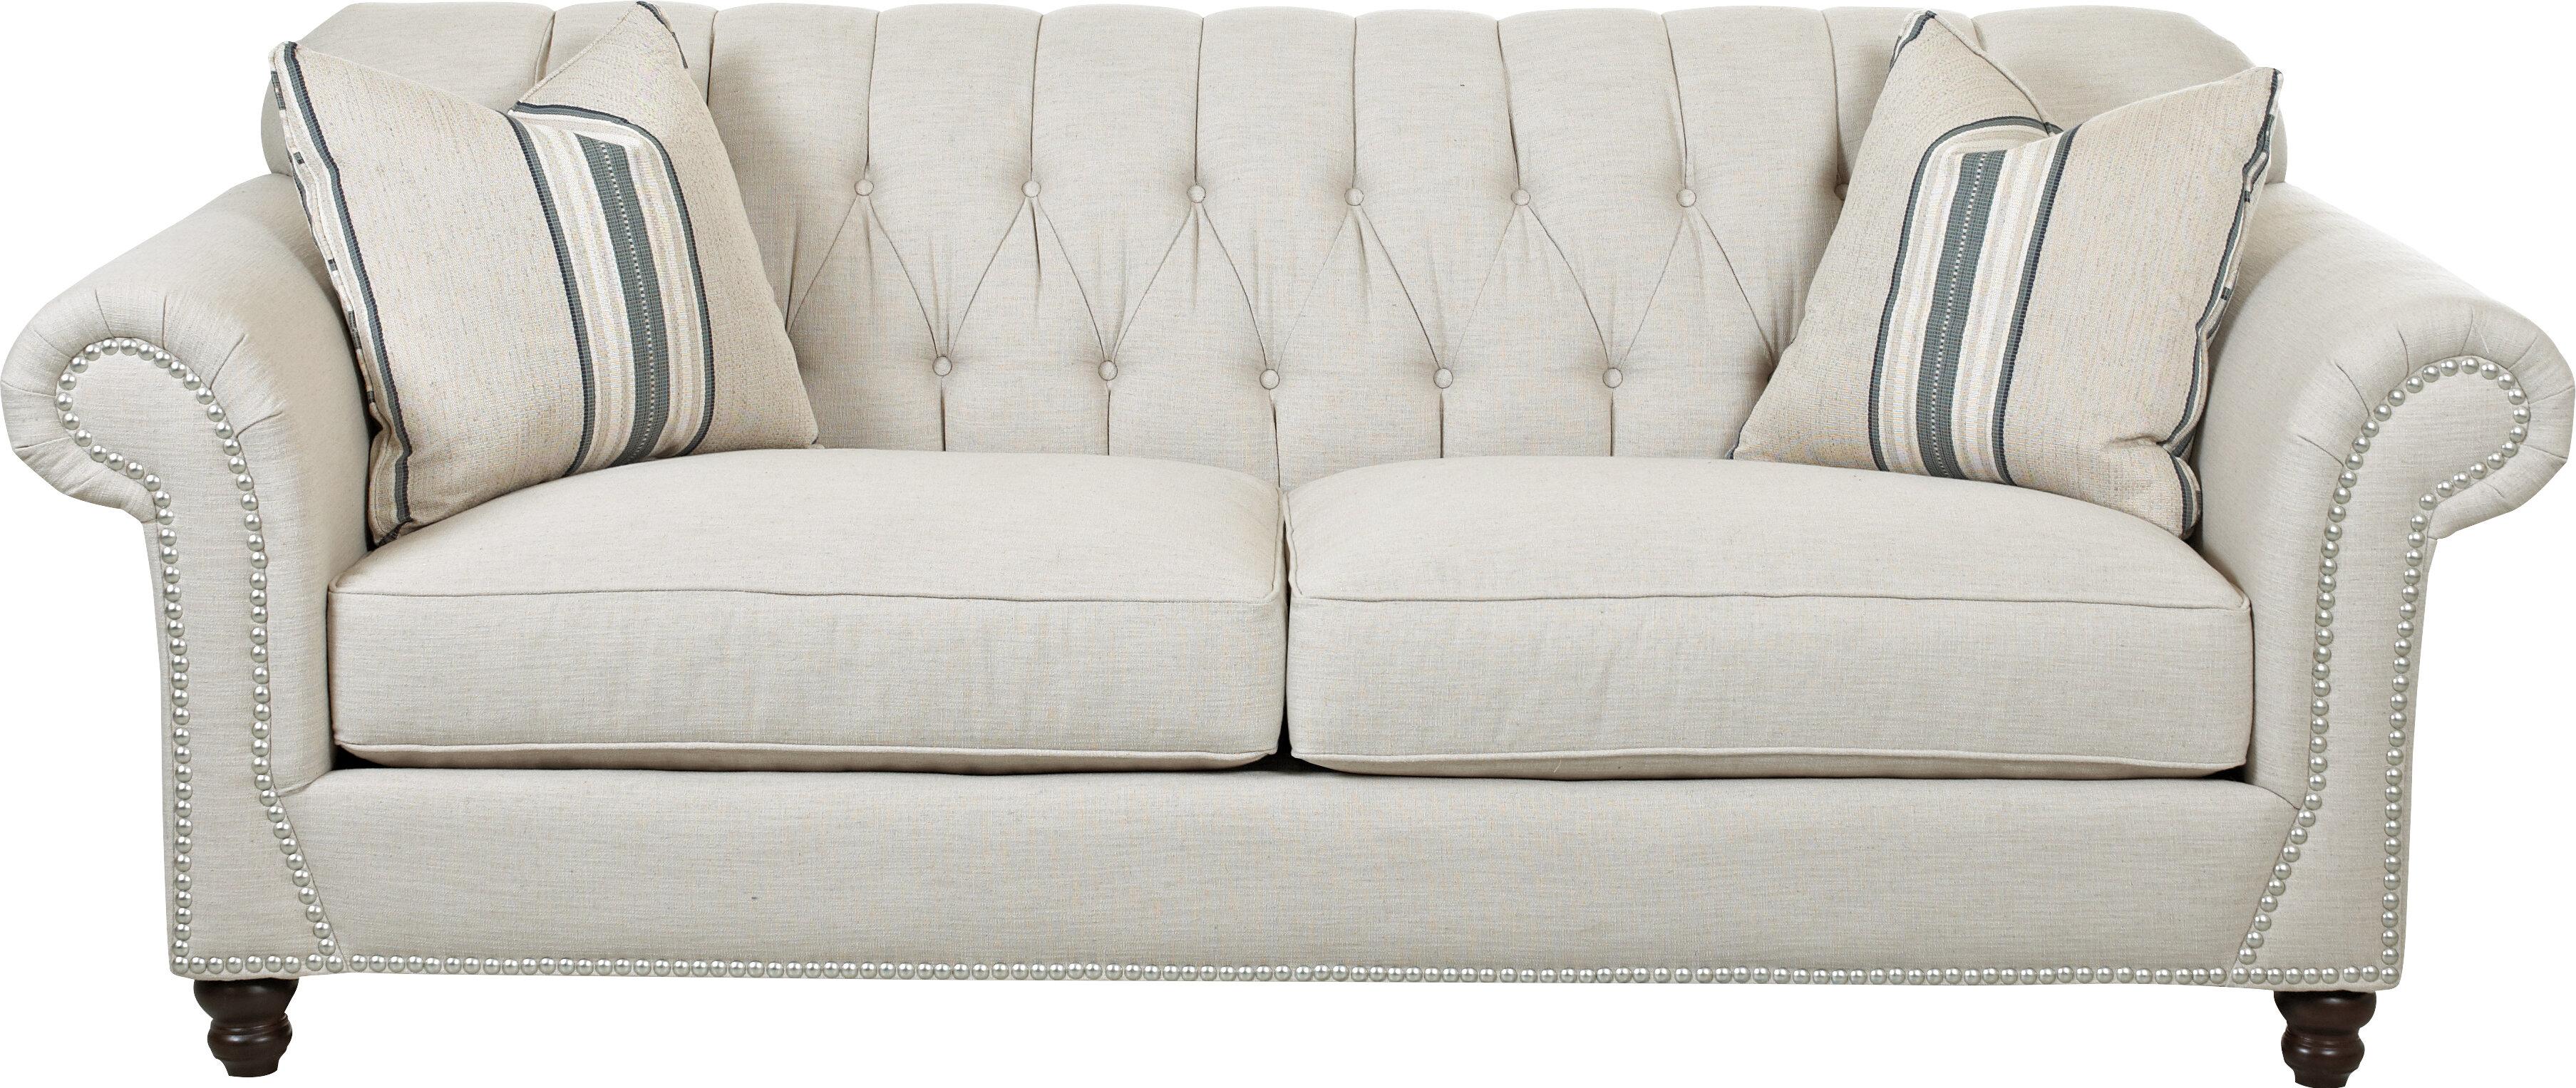 Klaussner Furniture Annie Sofa U0026 Reviews | Wayfair